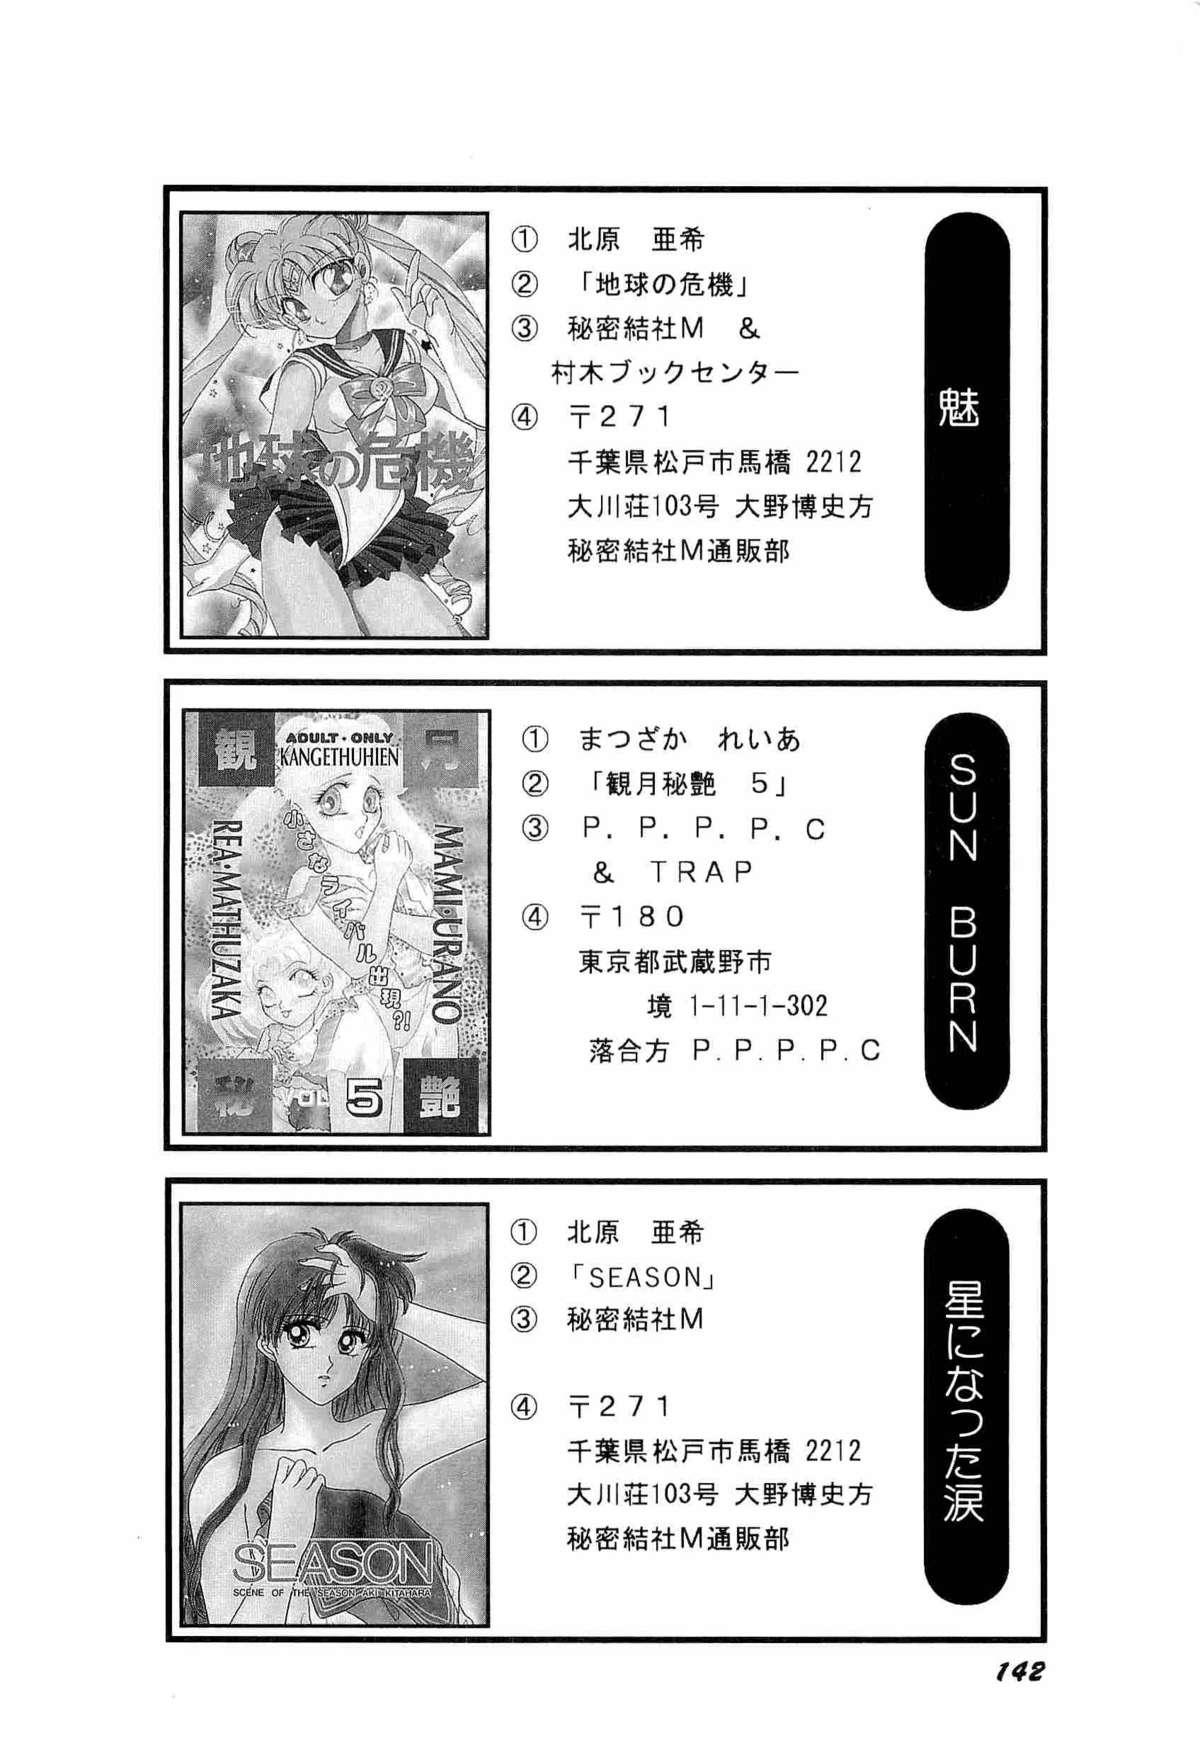 Bisyoujo Anthology '93 jyoukan 144